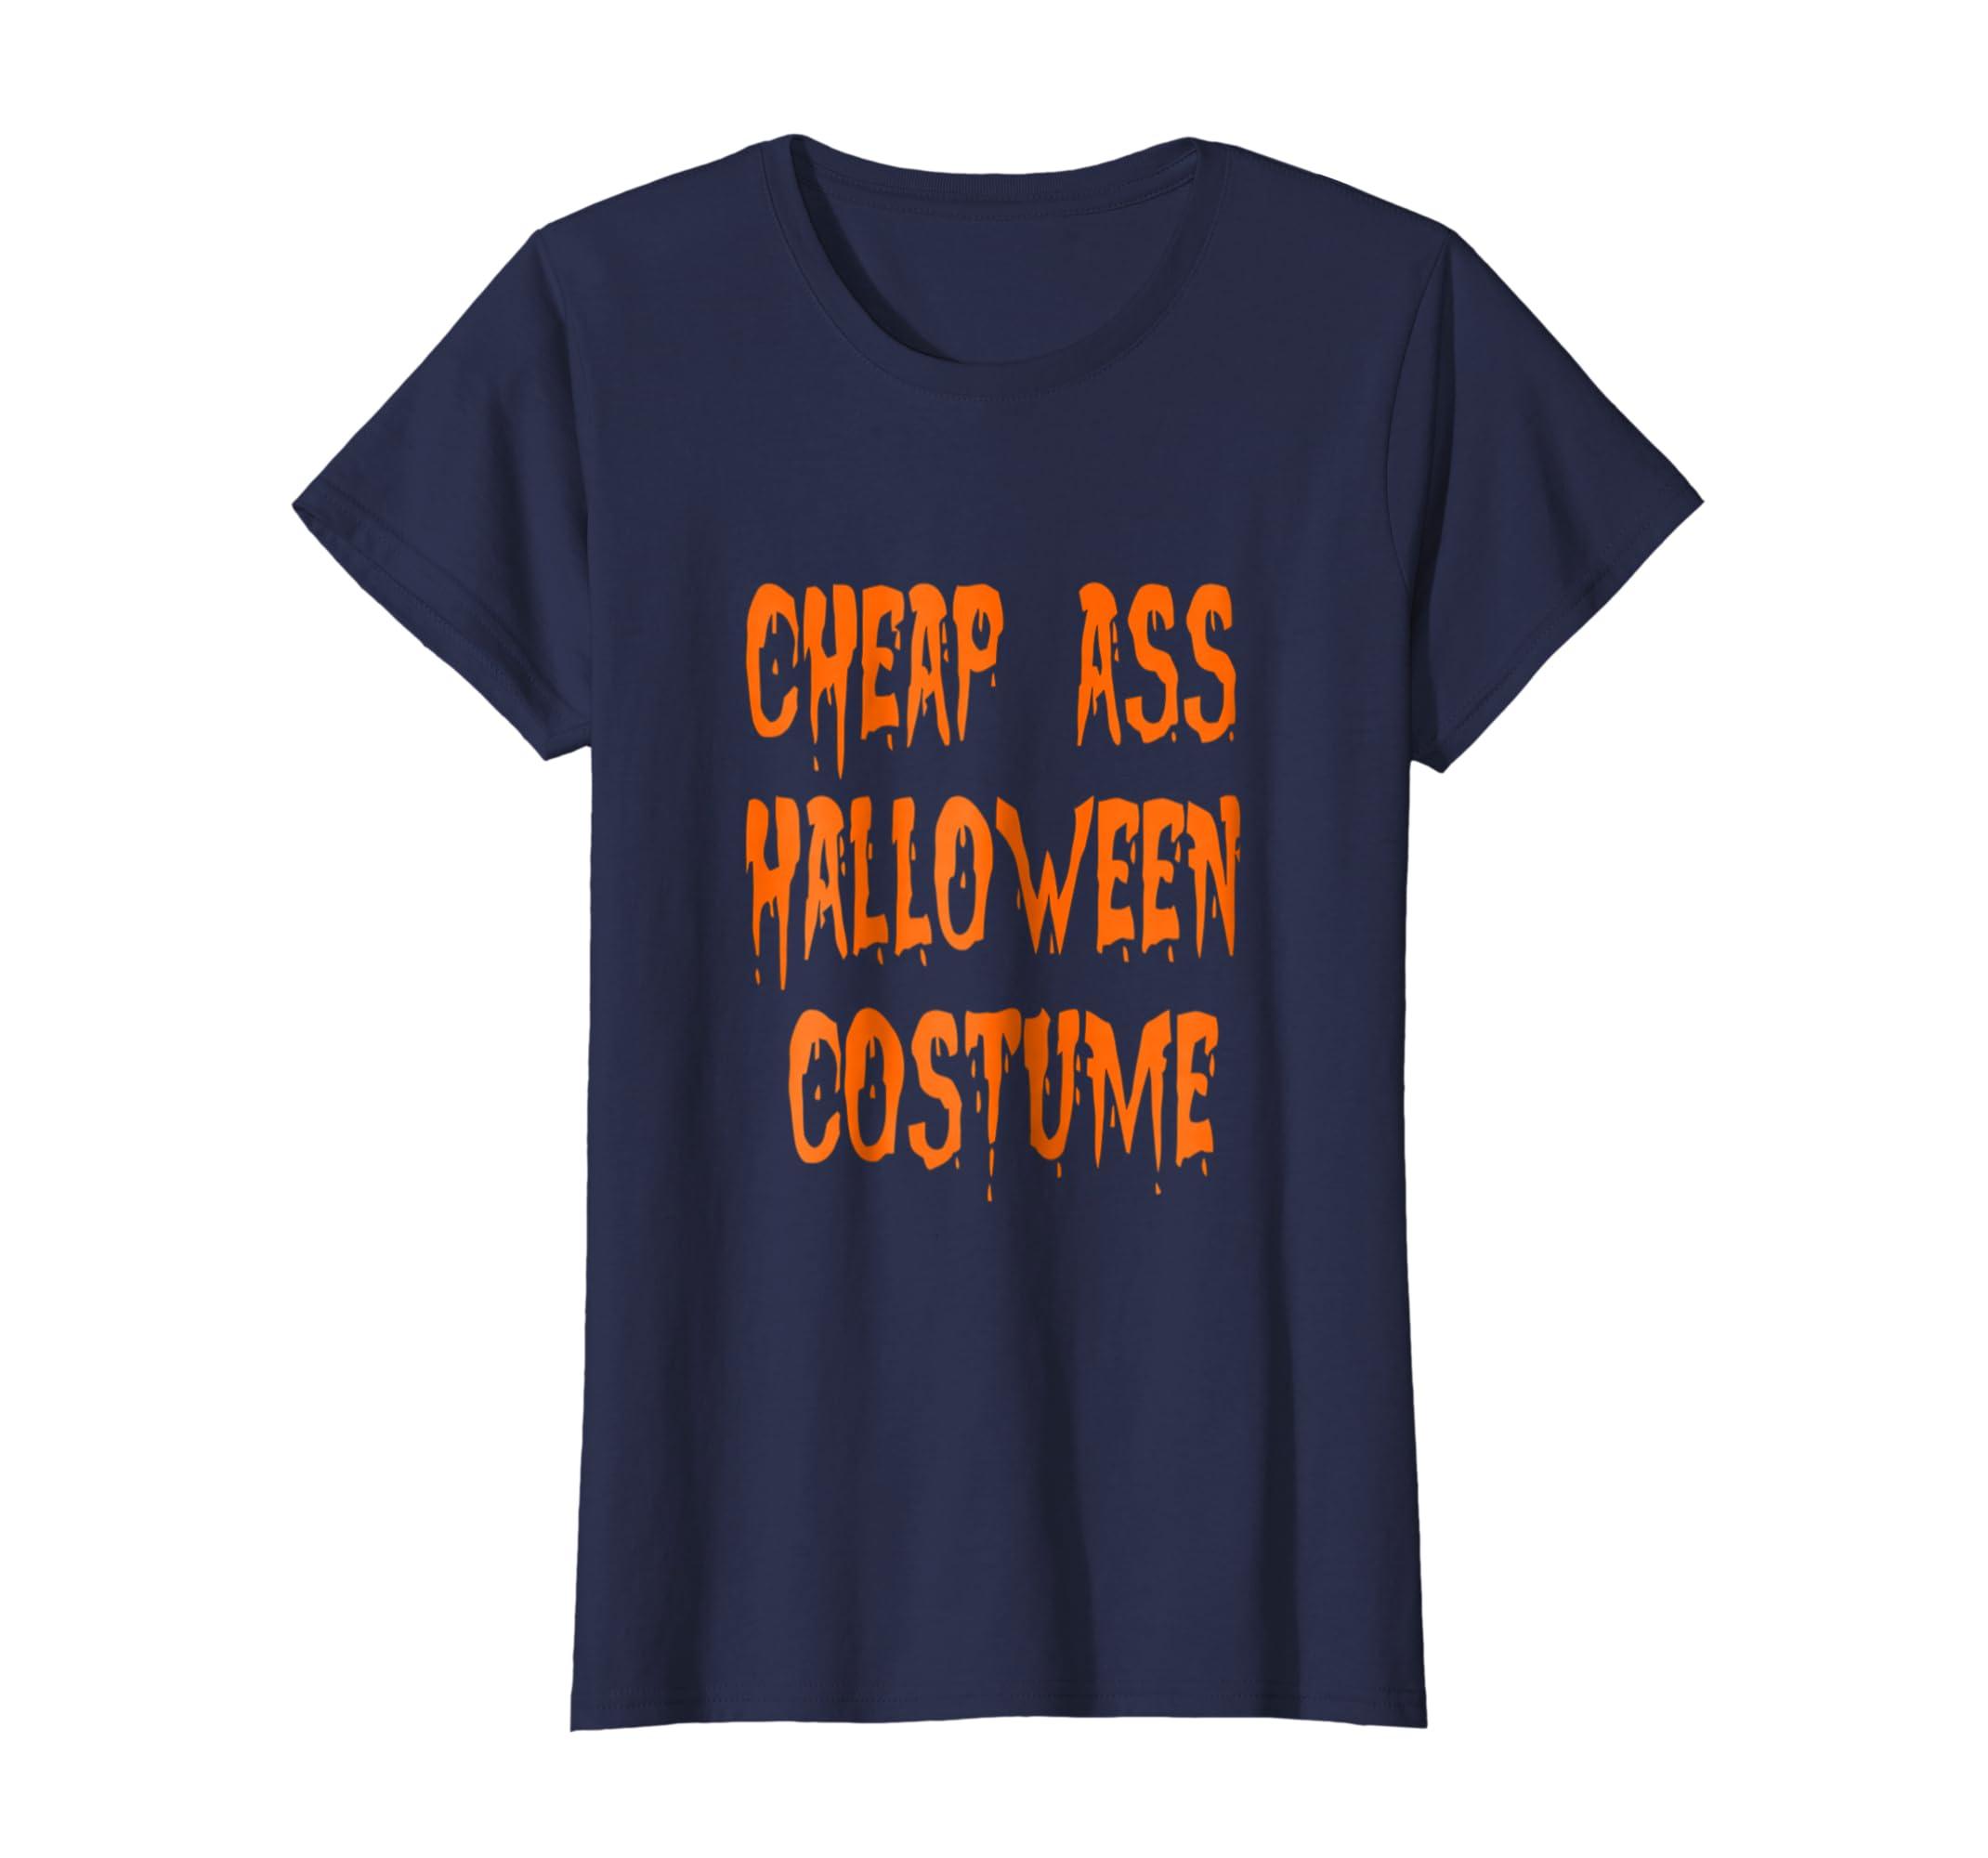 b9474219fd8e Amazon.com: cheap ass halloween costume funny t shirt: Clothing